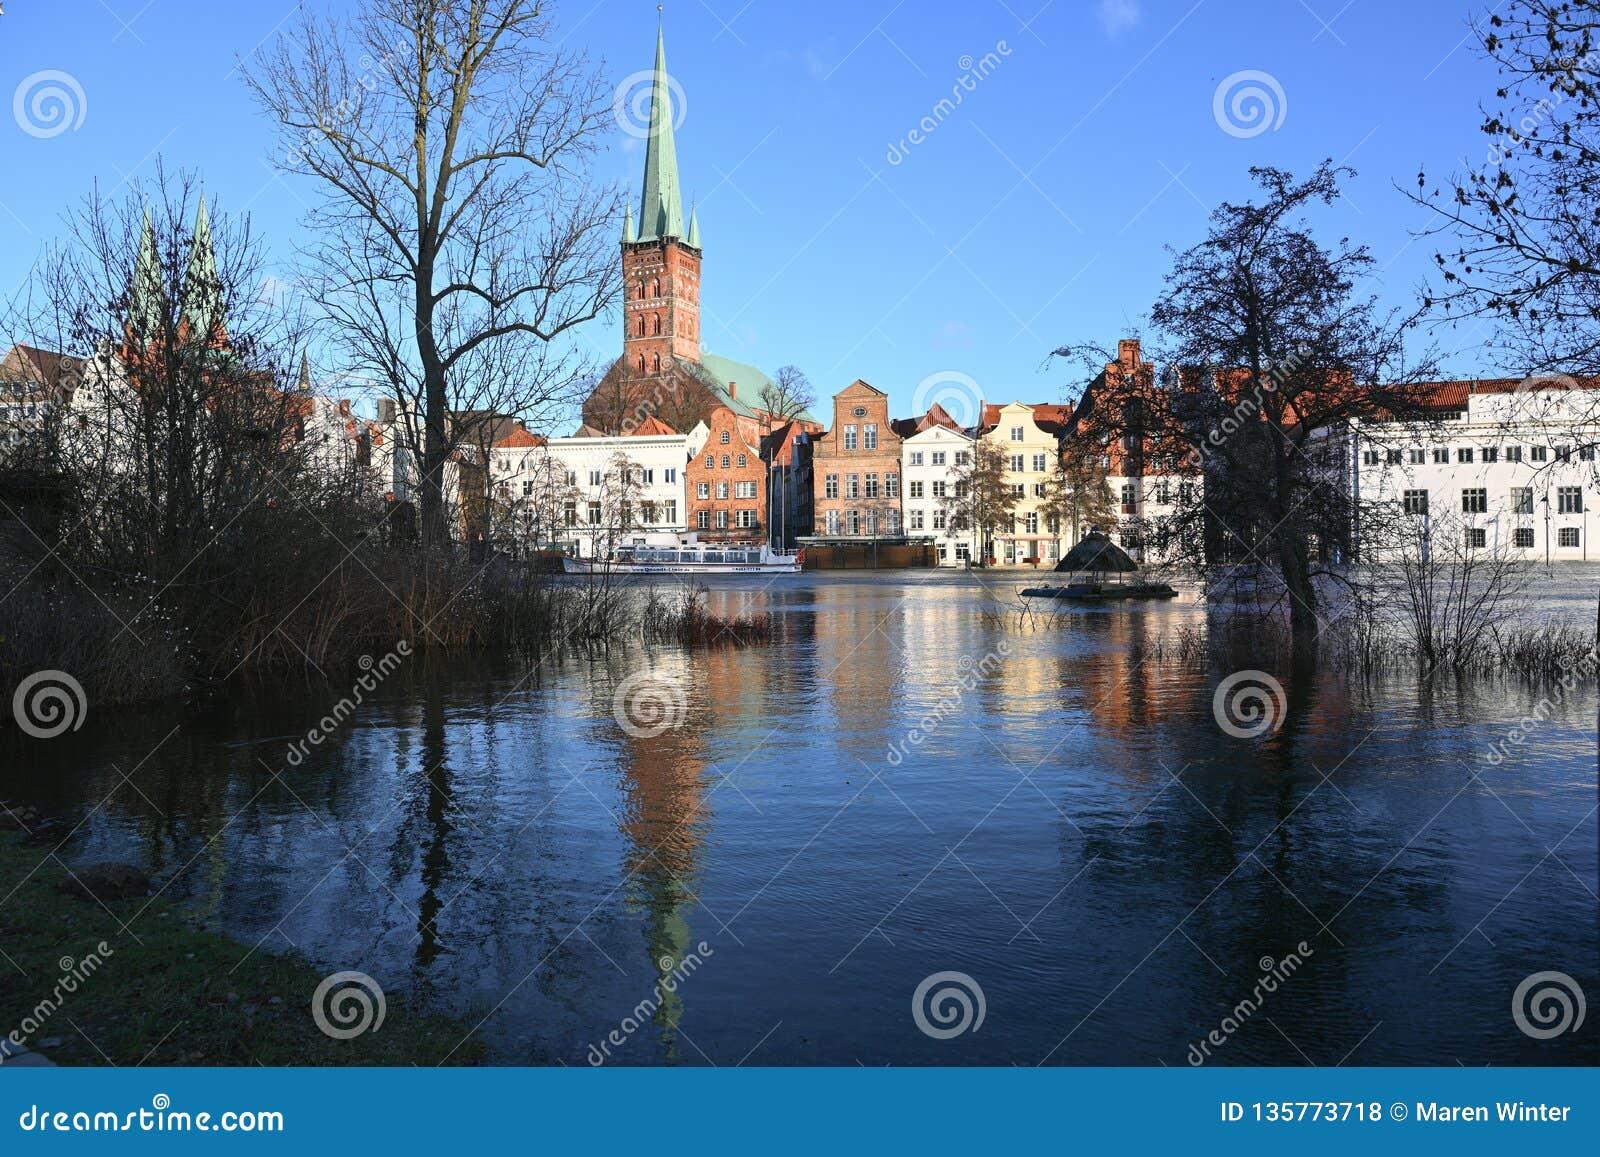 Sky Lübeck